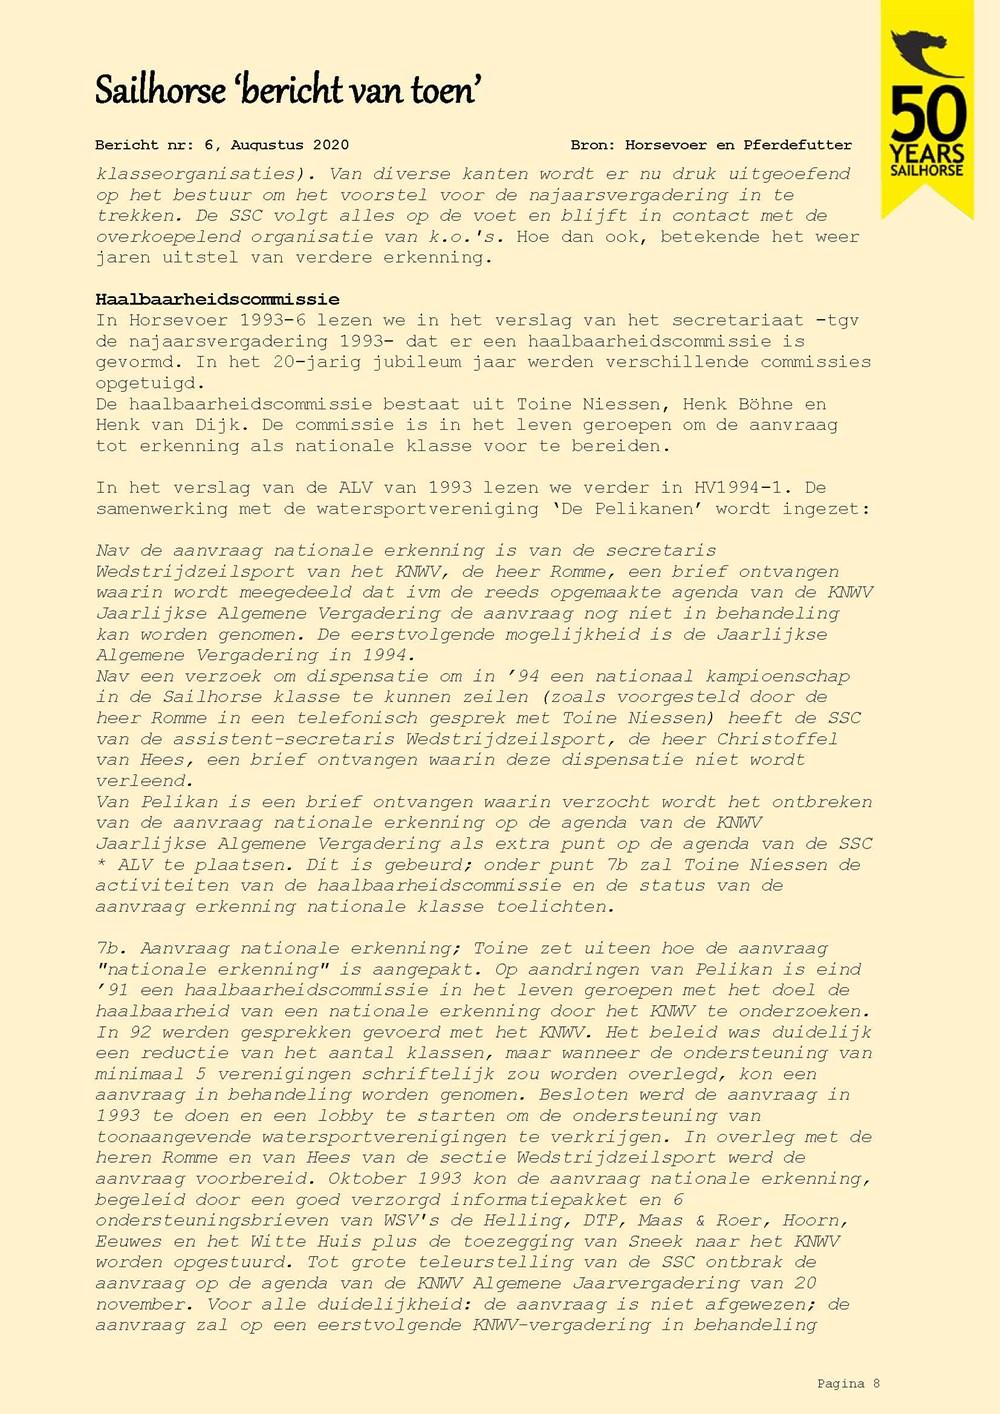 BvT06_3_Page_08.jpg